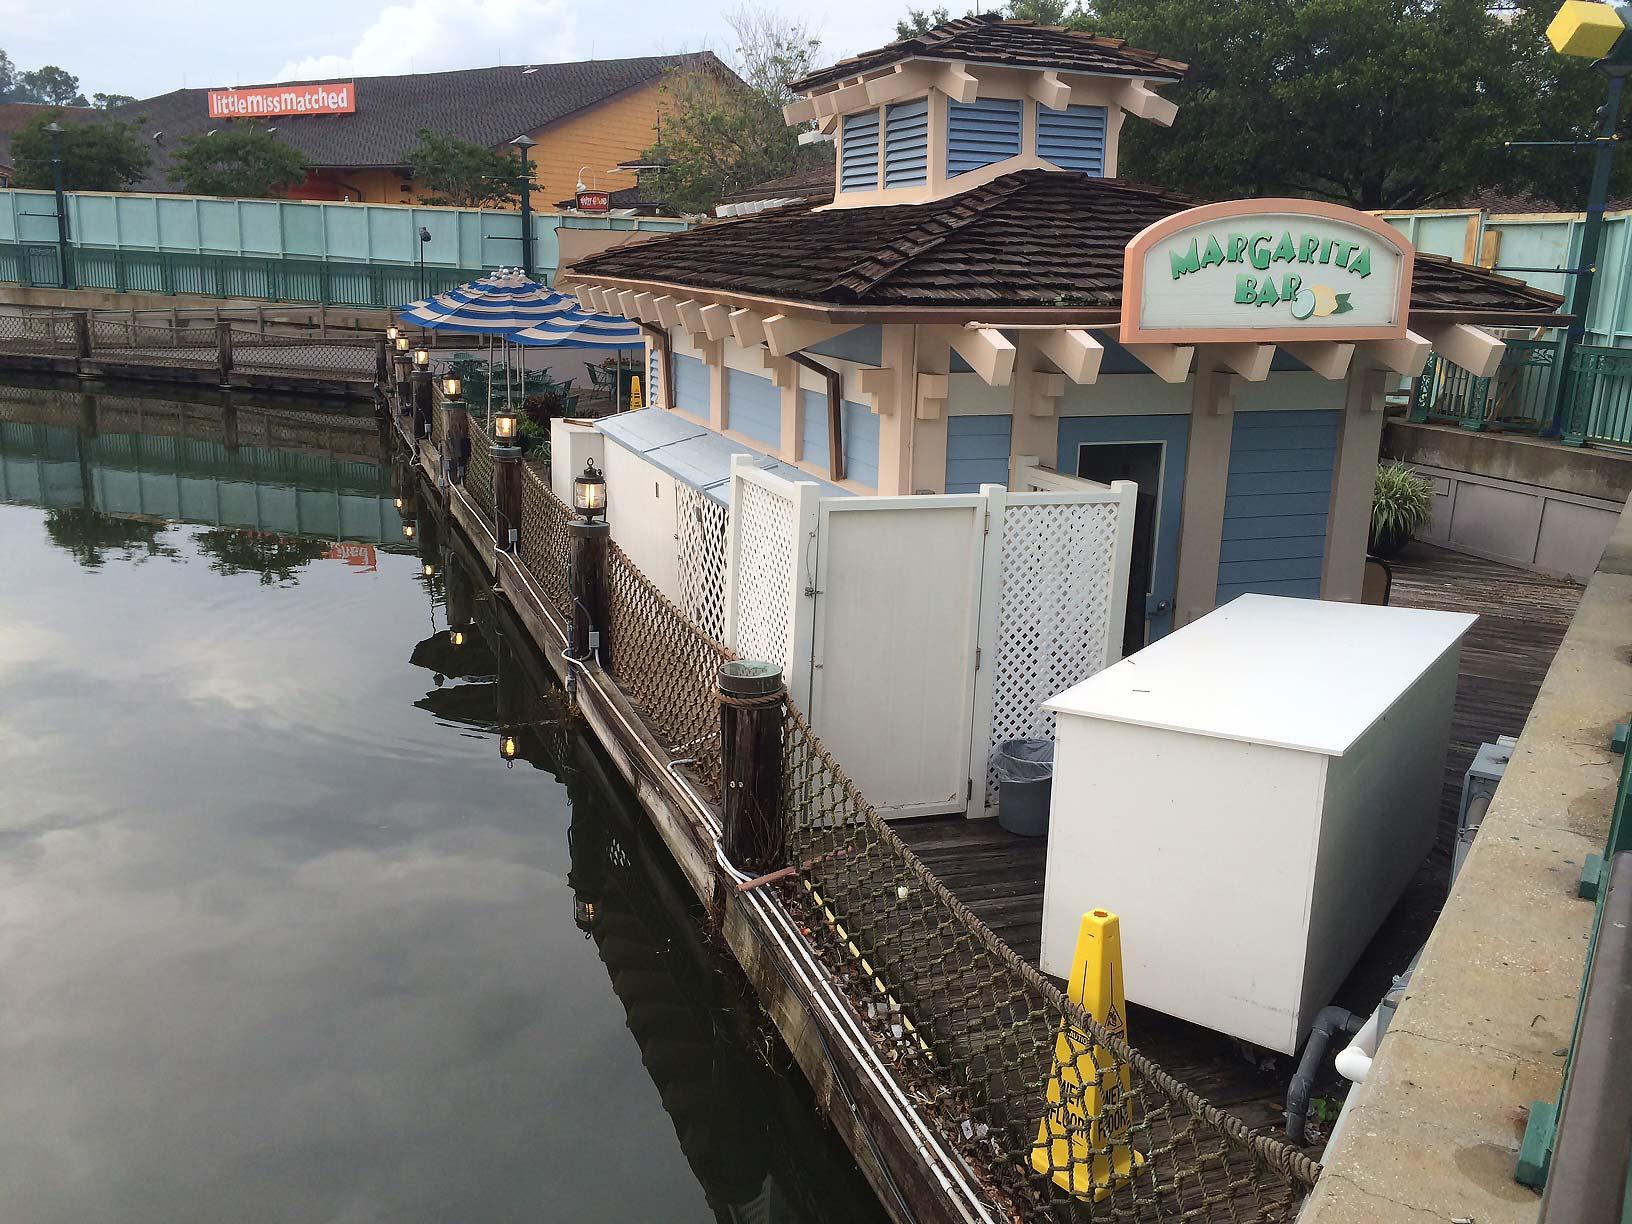 Cap N Jacks Margarita Bar closed and walled off